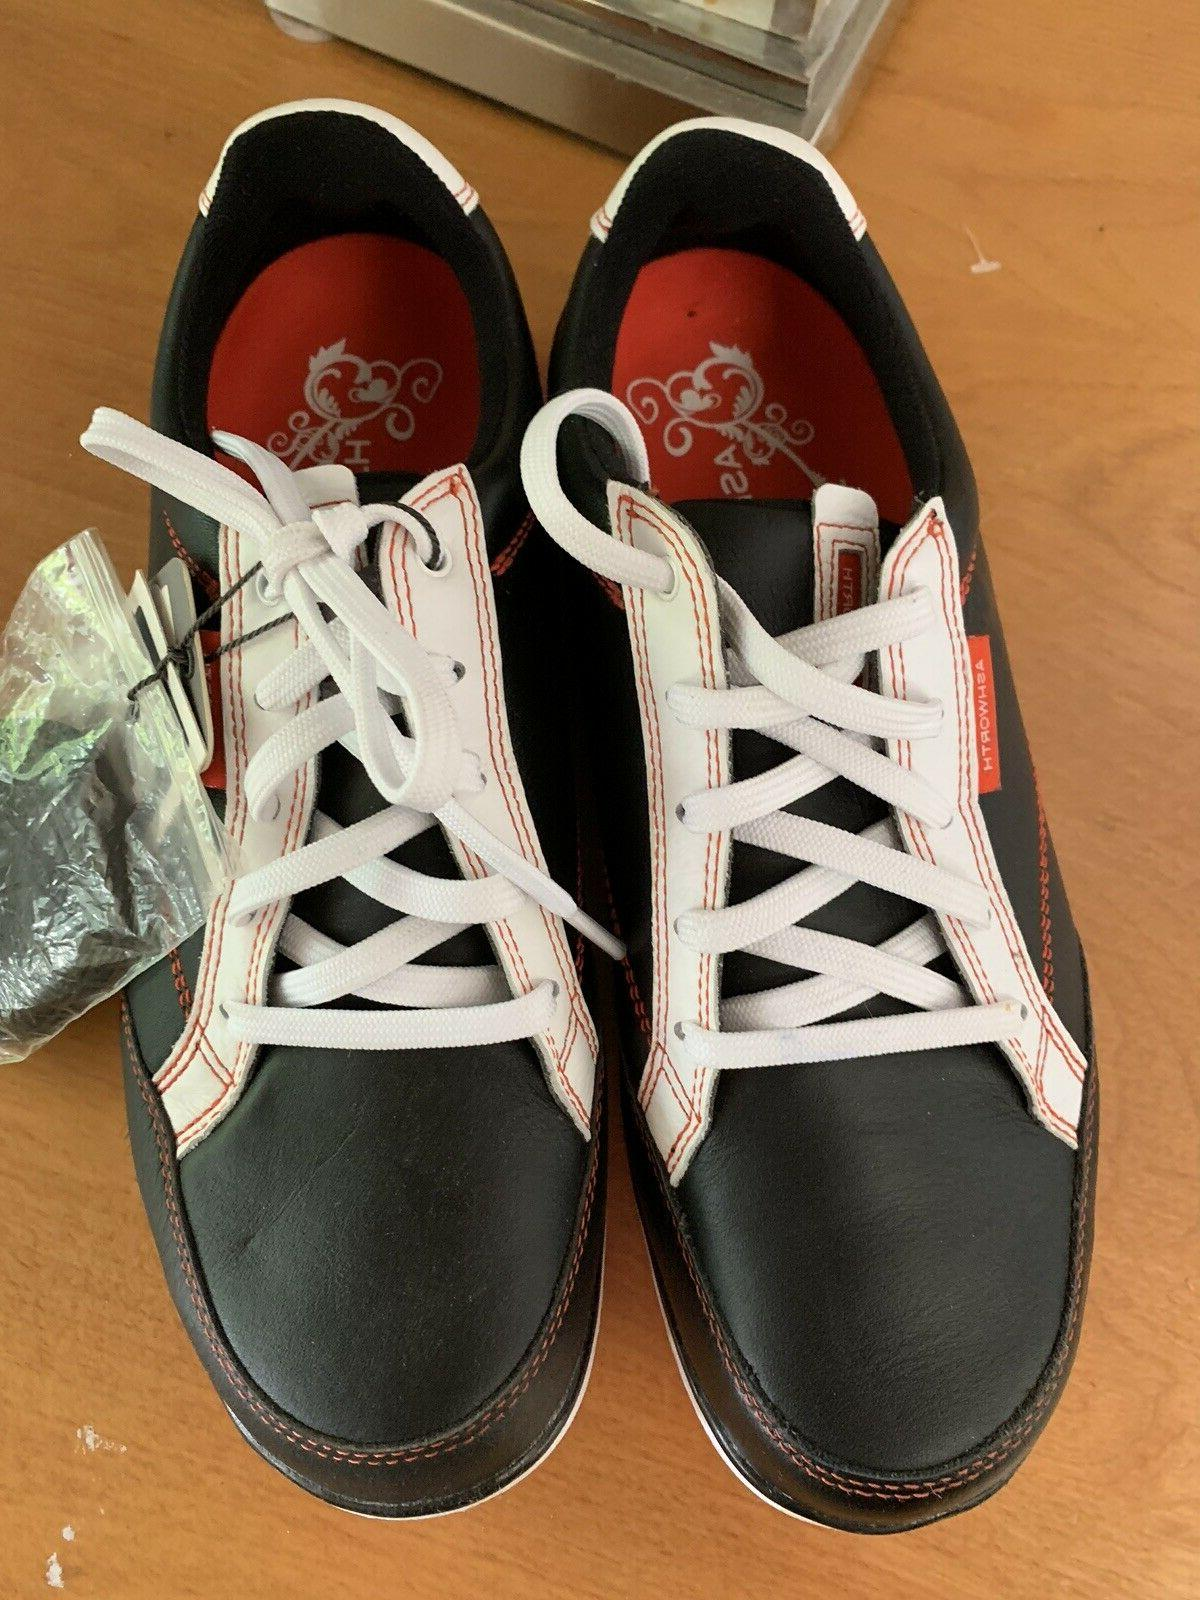 Ashworth Cardiff Womens Shoe 6.5 Leather